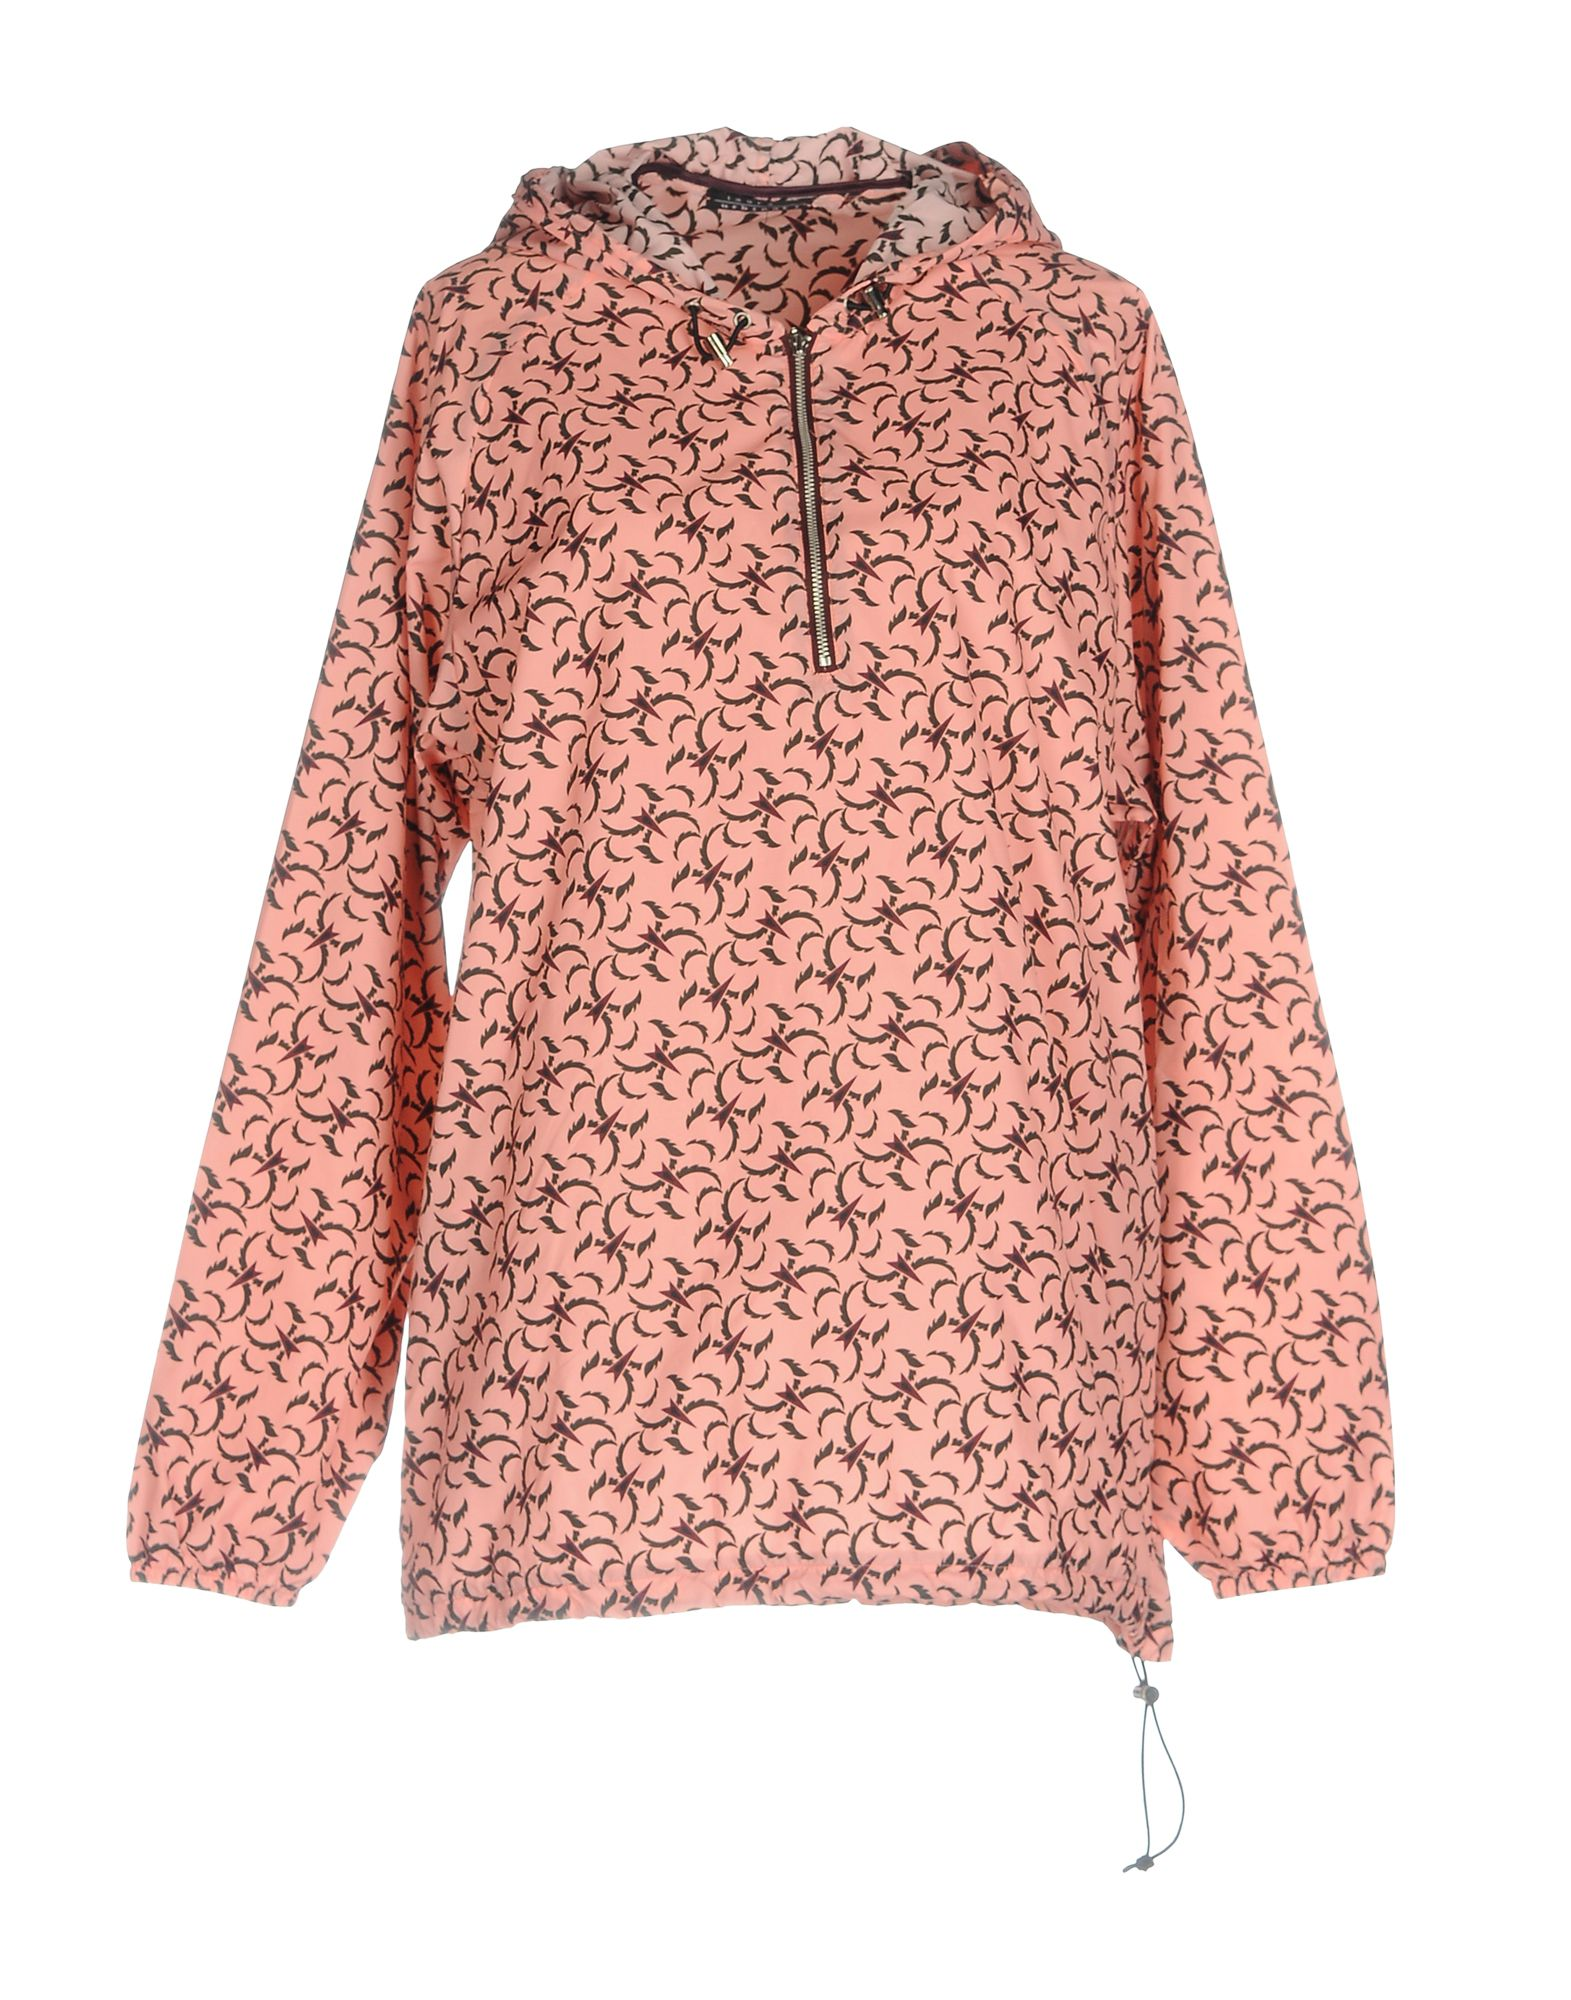 LAURA URBINATI Jacket in Pink